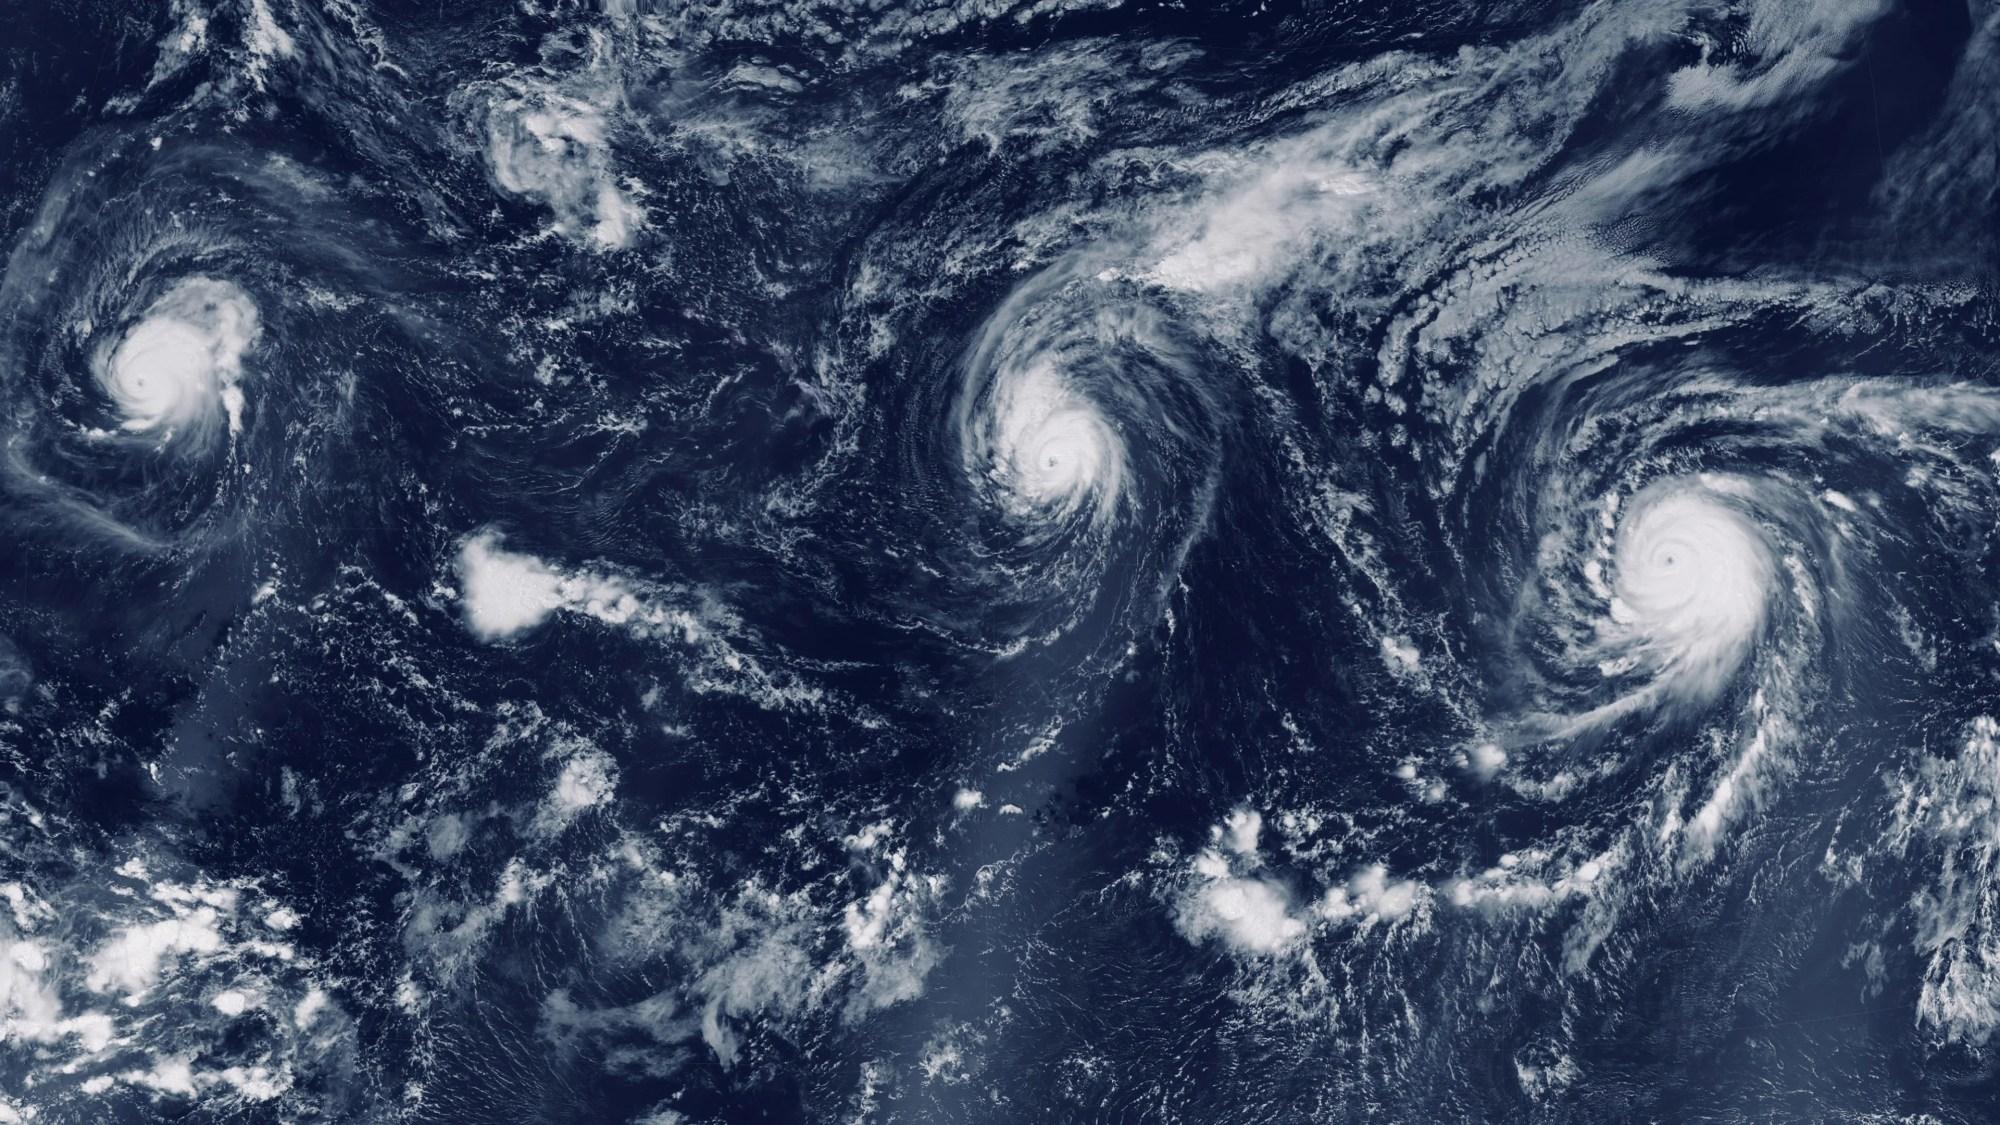 hight resolution of video eye of a large typhoon hurricane in the ocean hurricane storm tornado 84145494